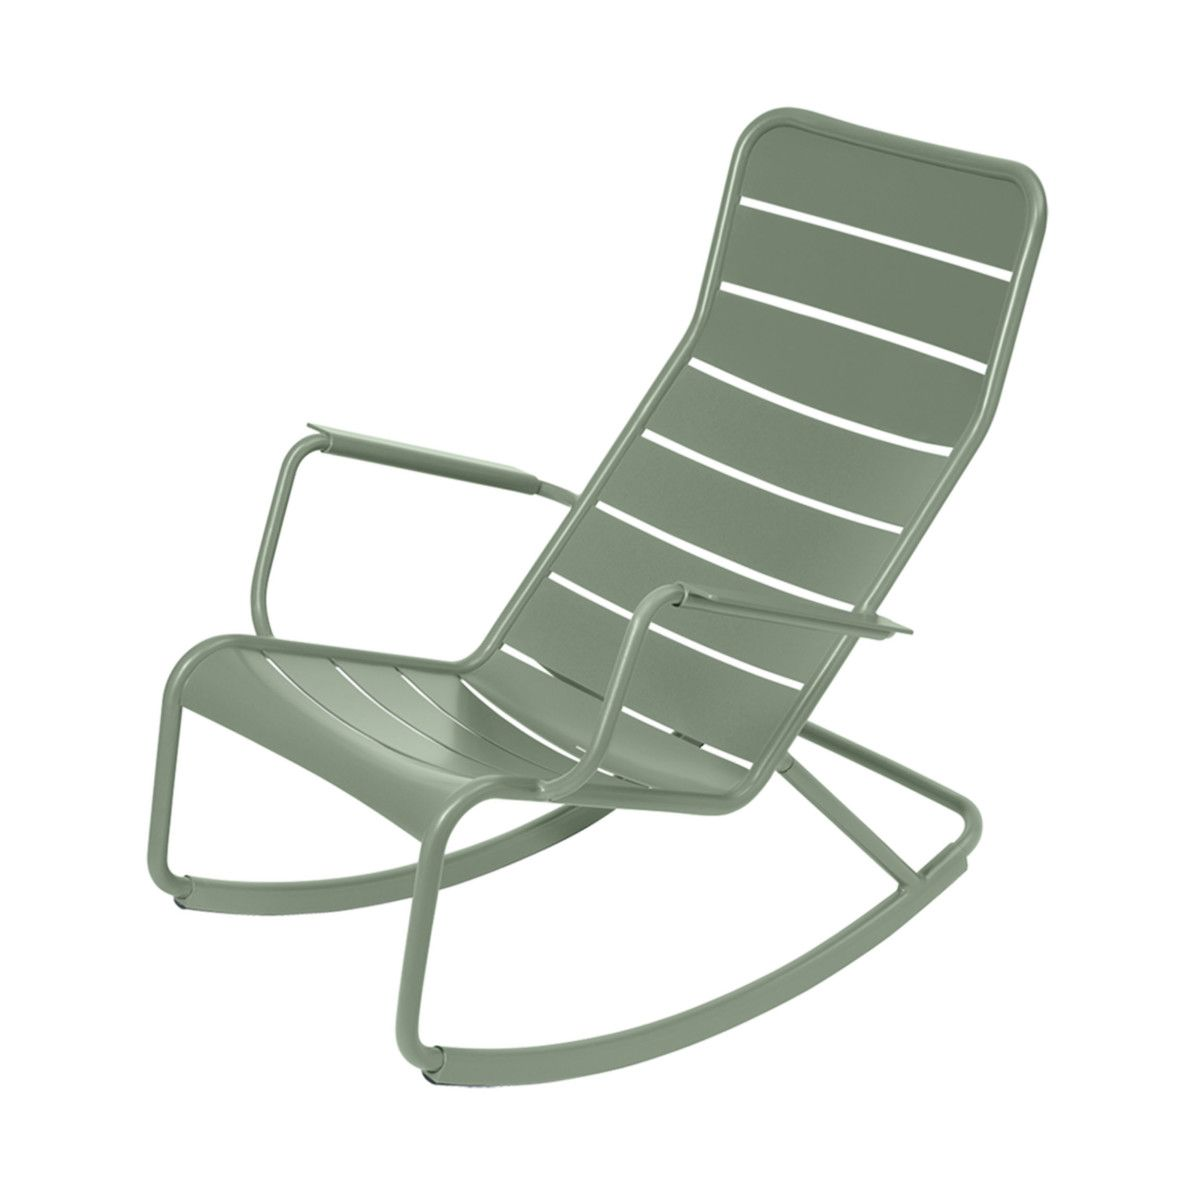 Luxembourg Rocking Chair Schaukelstuhl kaktus Jetzt bestellen unter ...